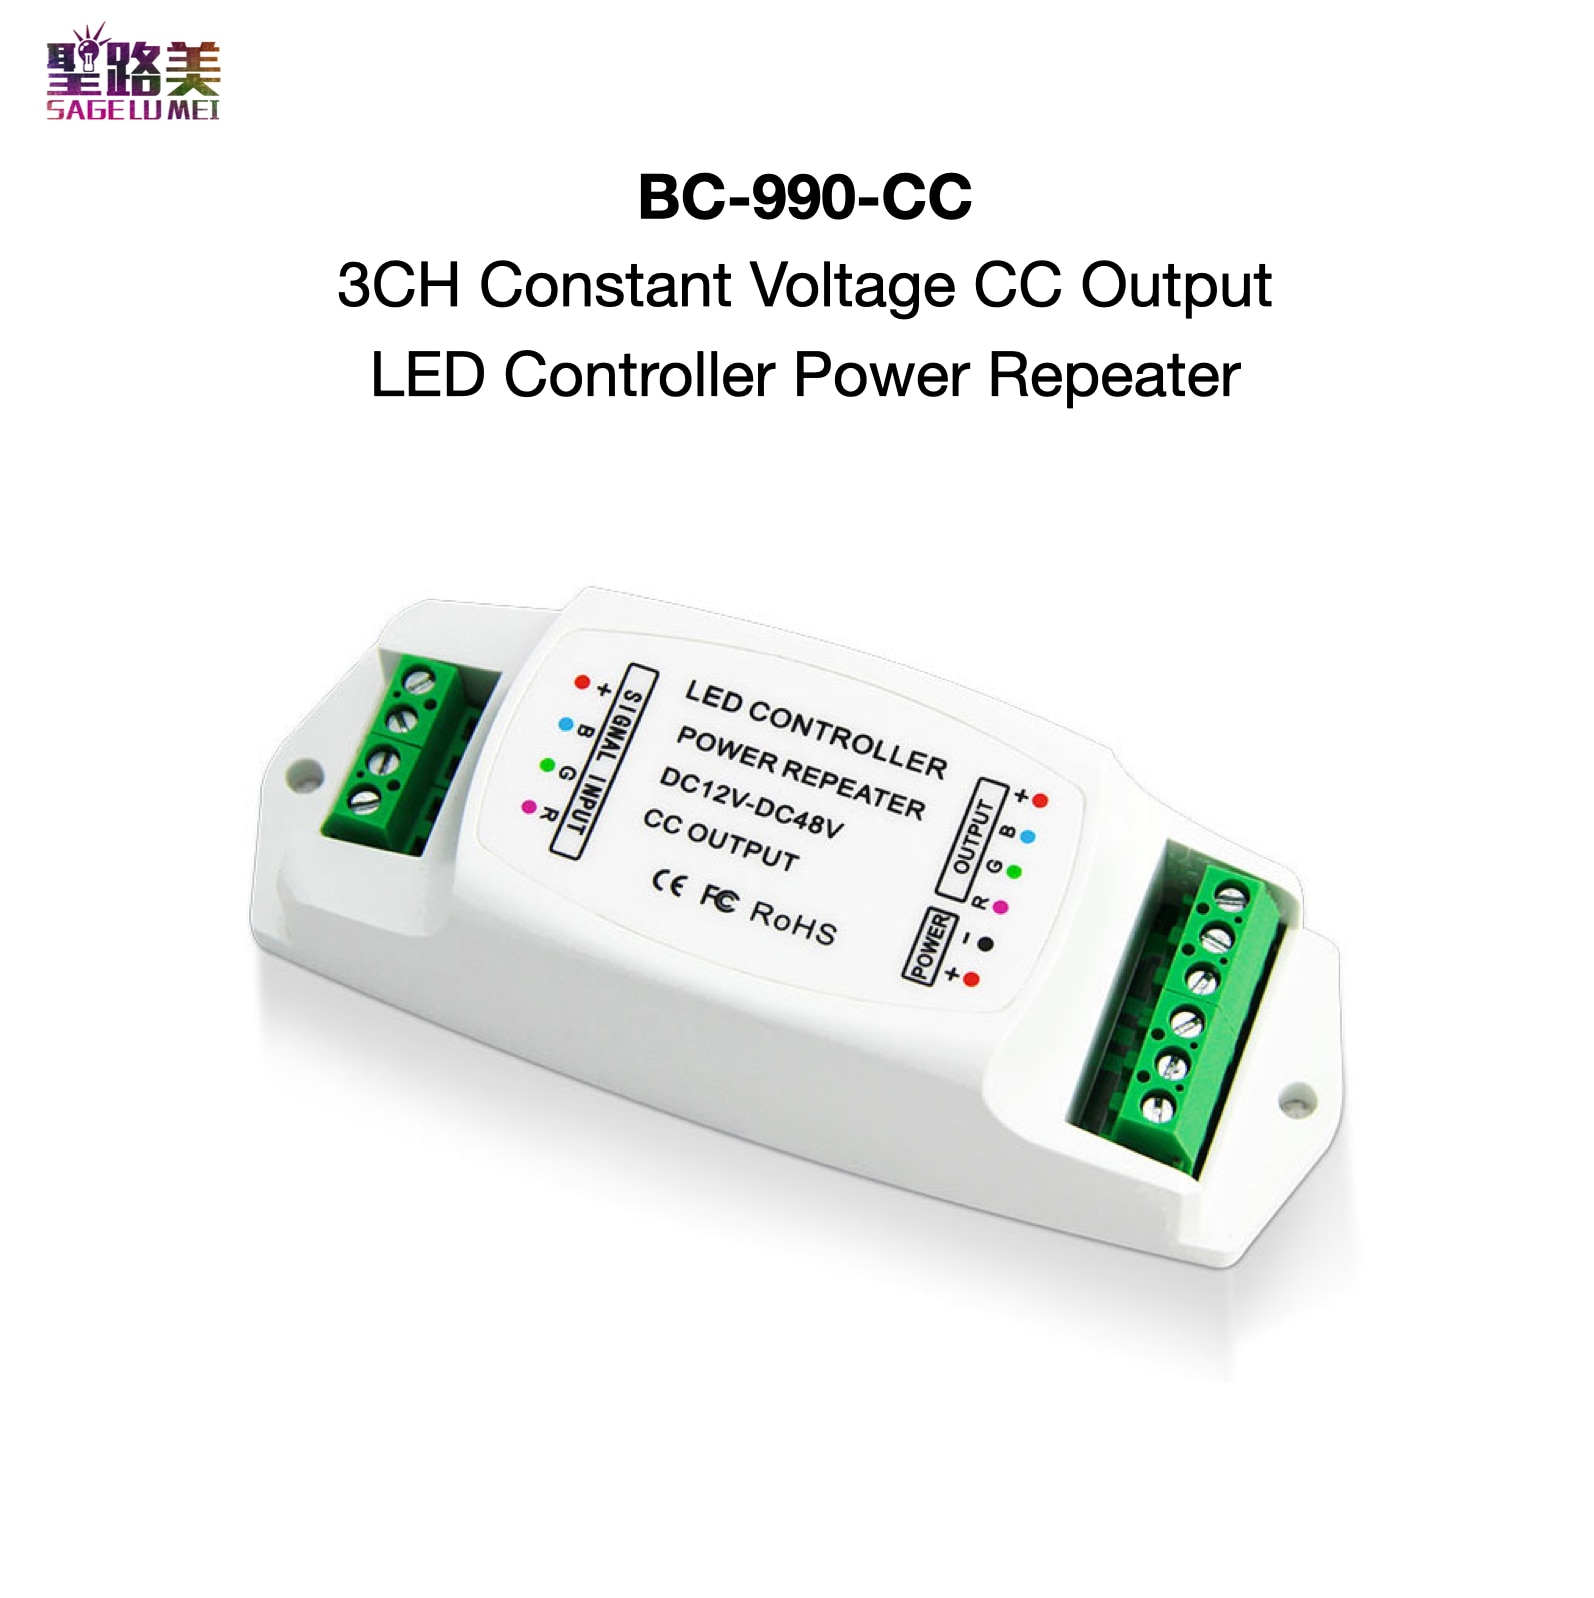 BC-990-CC 3CH voltaje constante CC salida LED controlador de potencia repetidor DC 12V ~ 48V Max.350mA/700mA cada canal PWM BINCOLOR